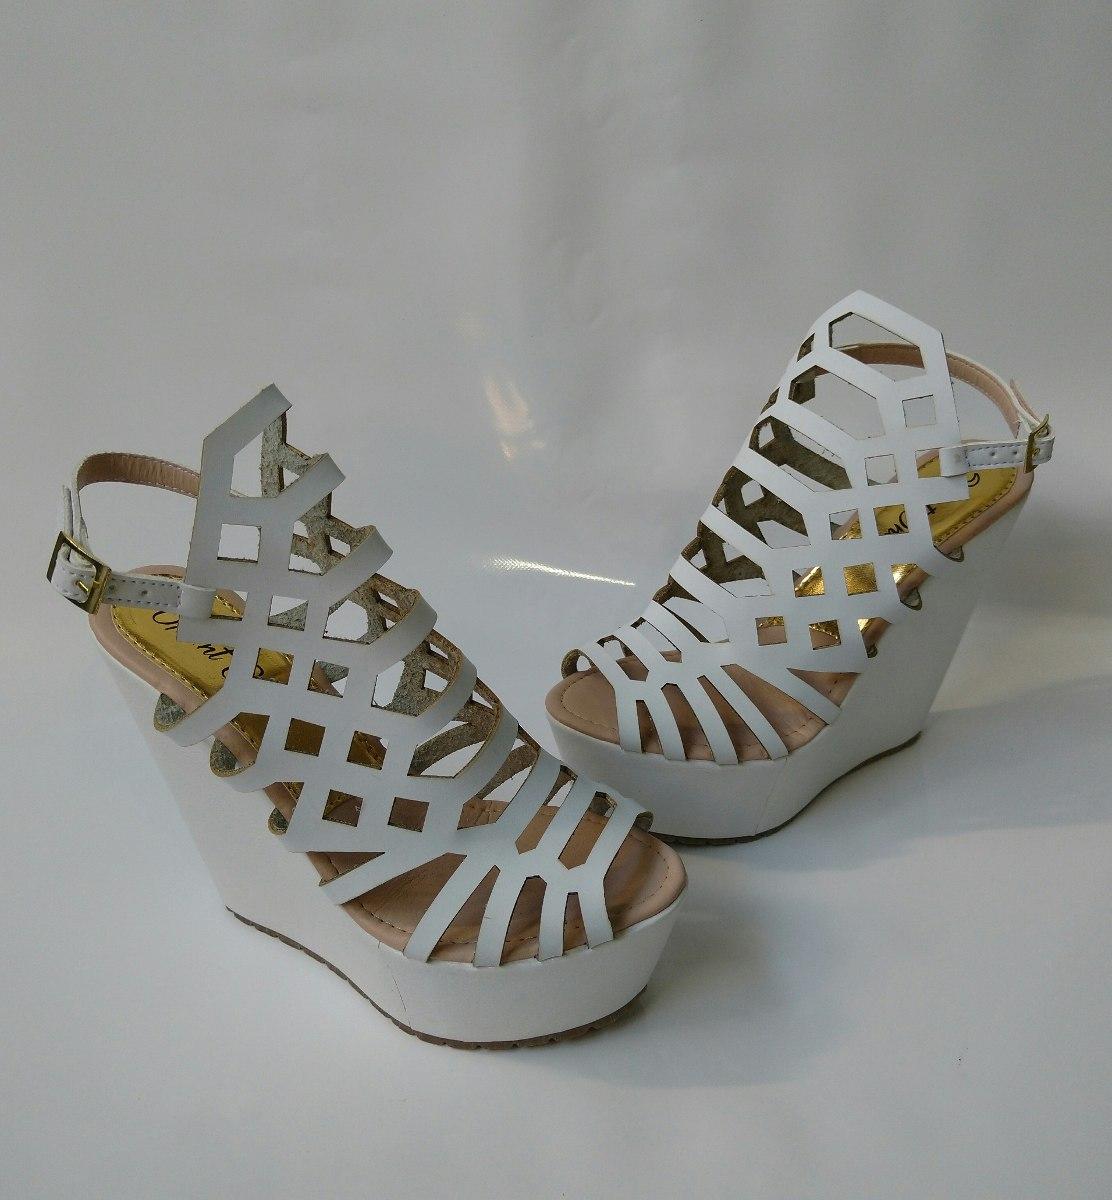 ceb966ed calzado alto plataforma blanco de moda beige envio gratis. Cargando zoom.